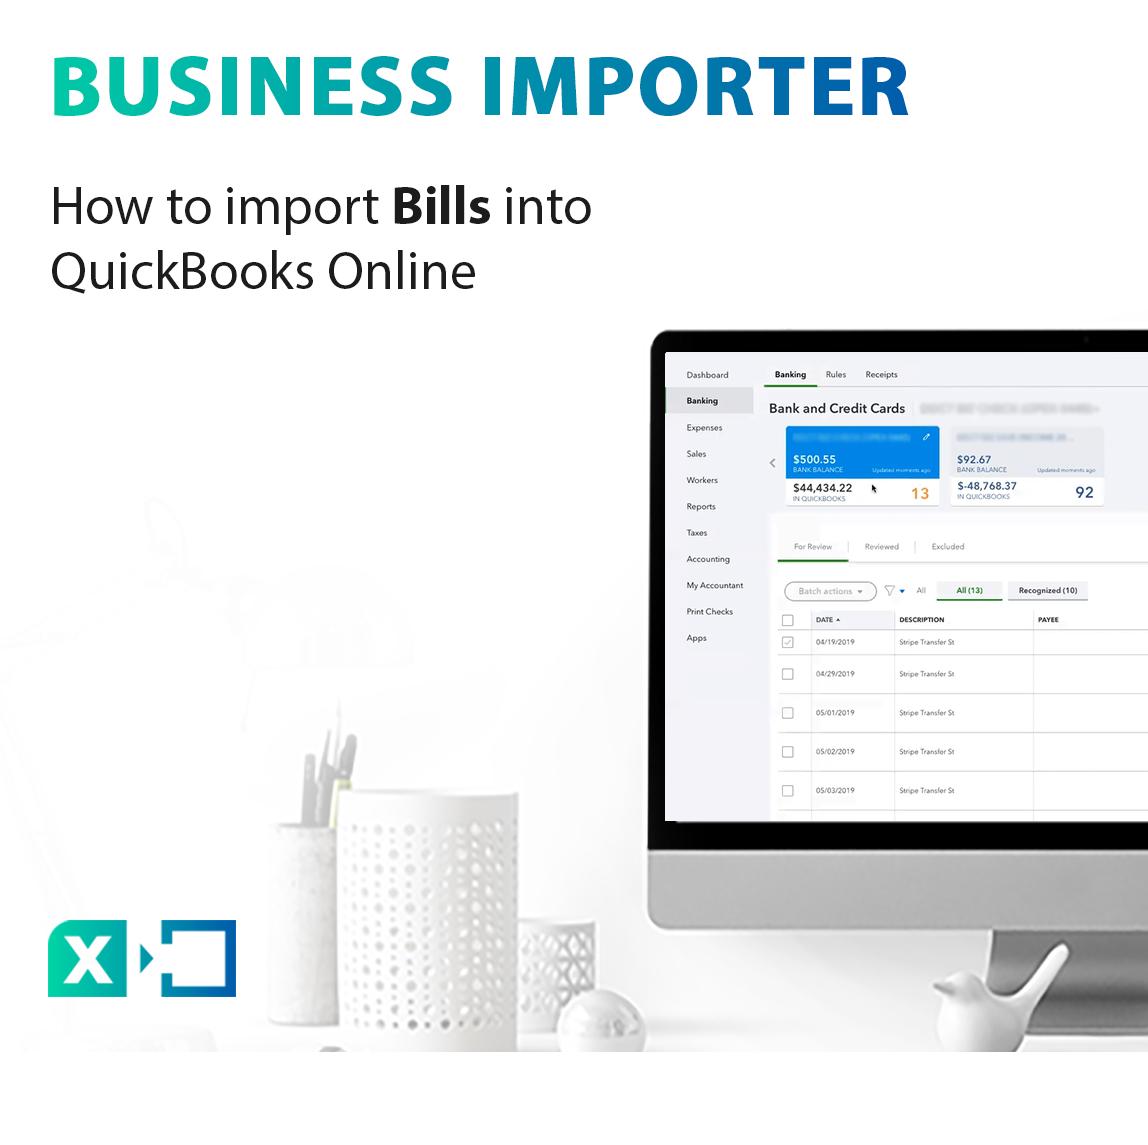 How to import Bills into QuickBooks Online